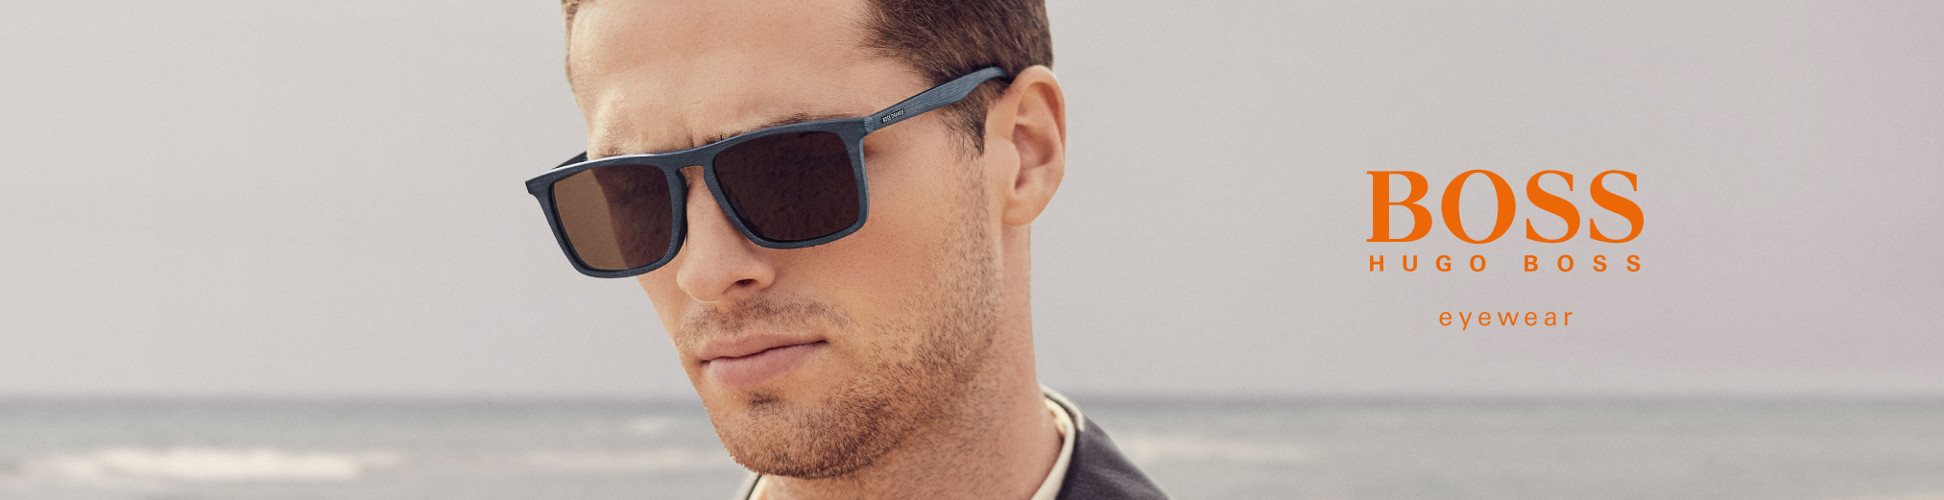 230ec5fae9c9 BOSS ORANGE Herren-Sonnenbrillen online bei Mister Spex